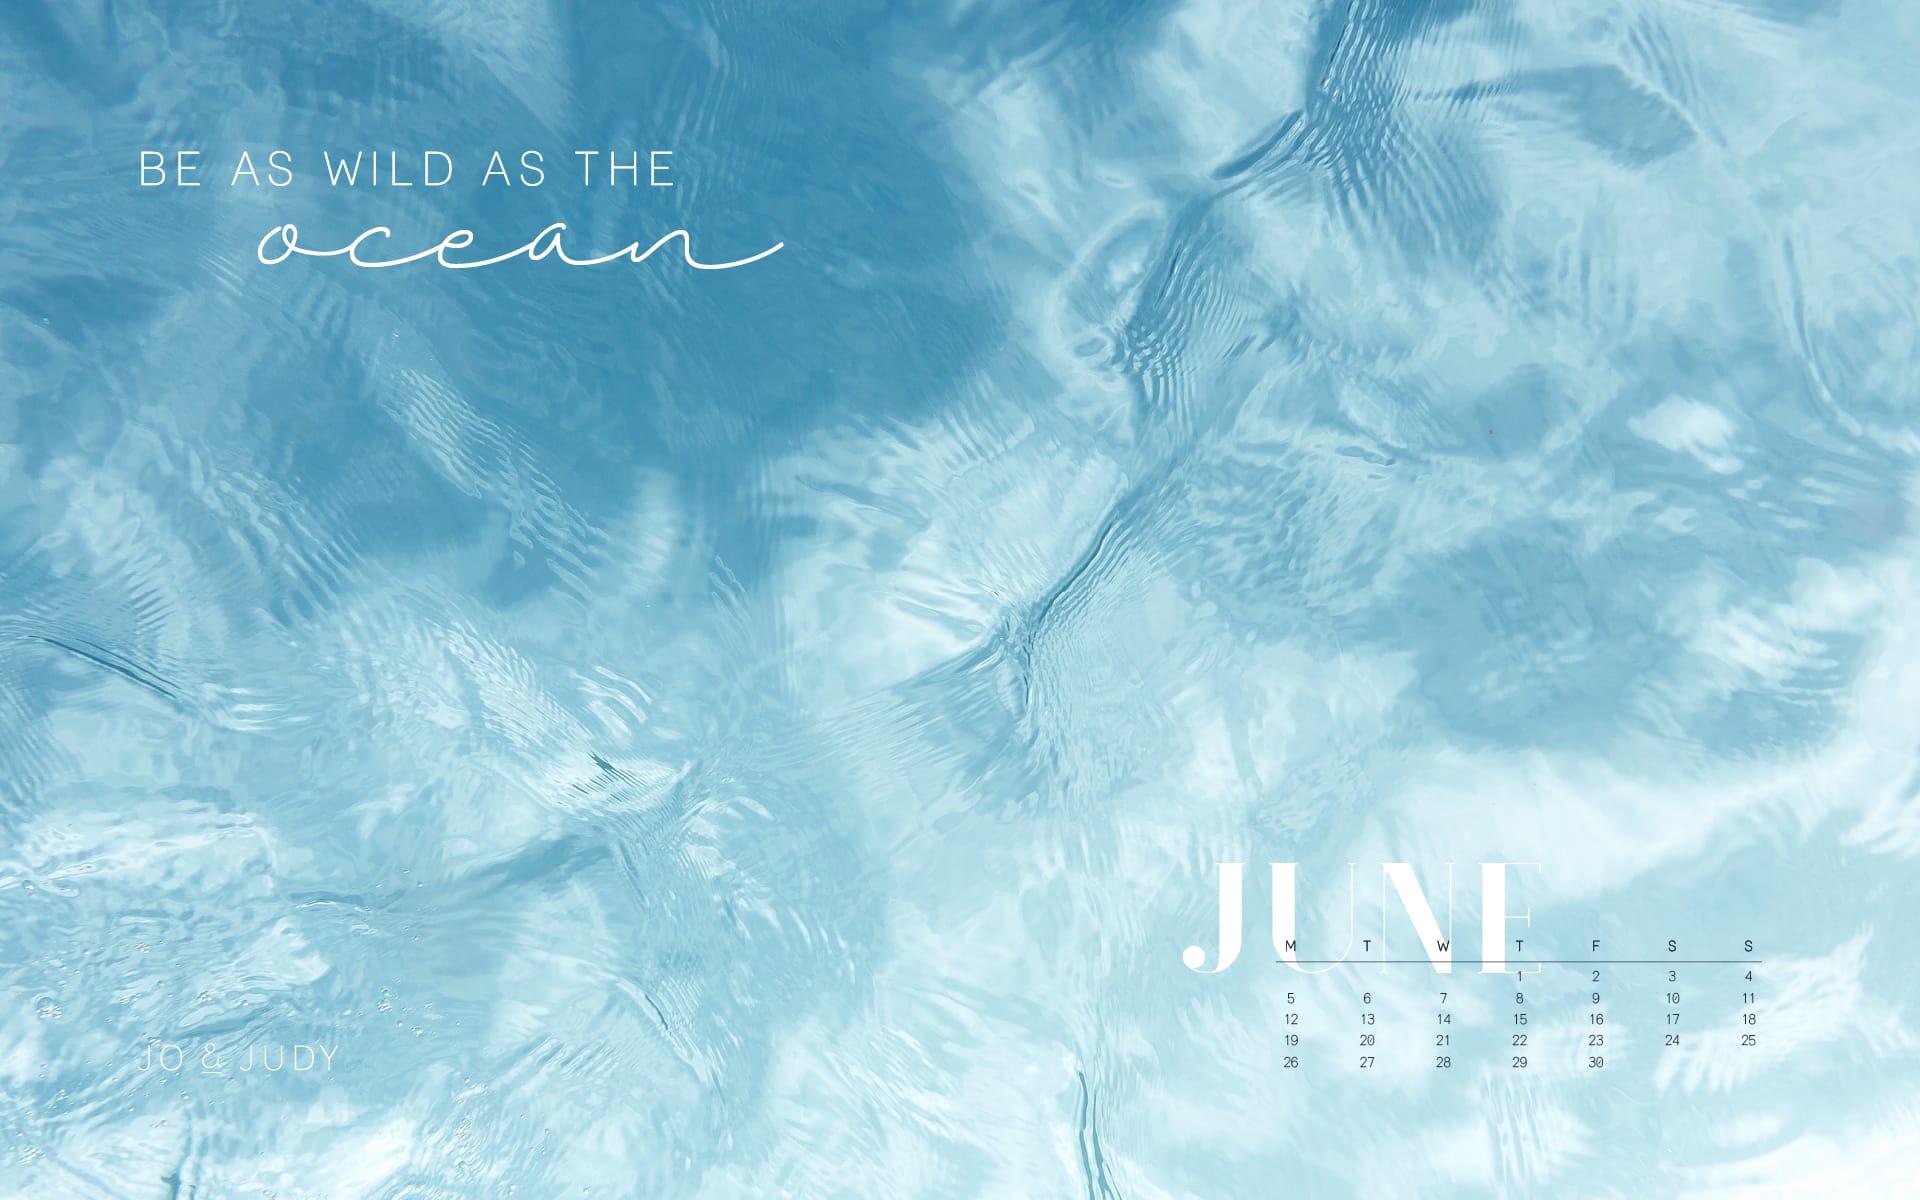 free wallpapers discover new designs every month jo judy rh joandjudy com